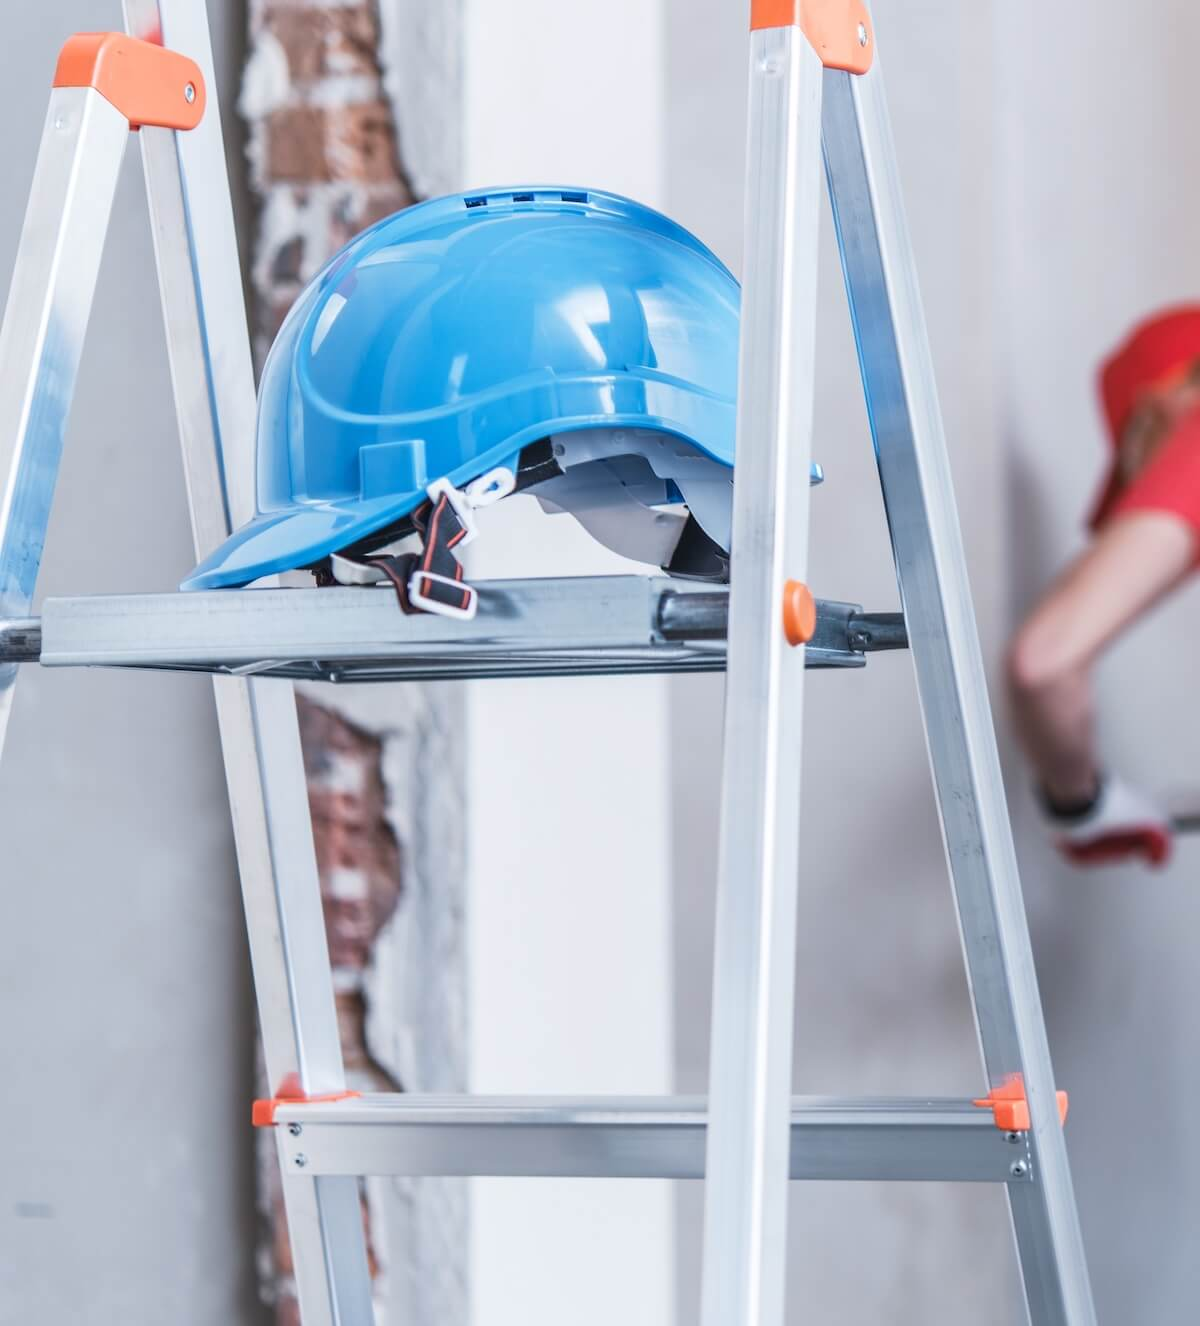 SAFETY ALERT on Ladders